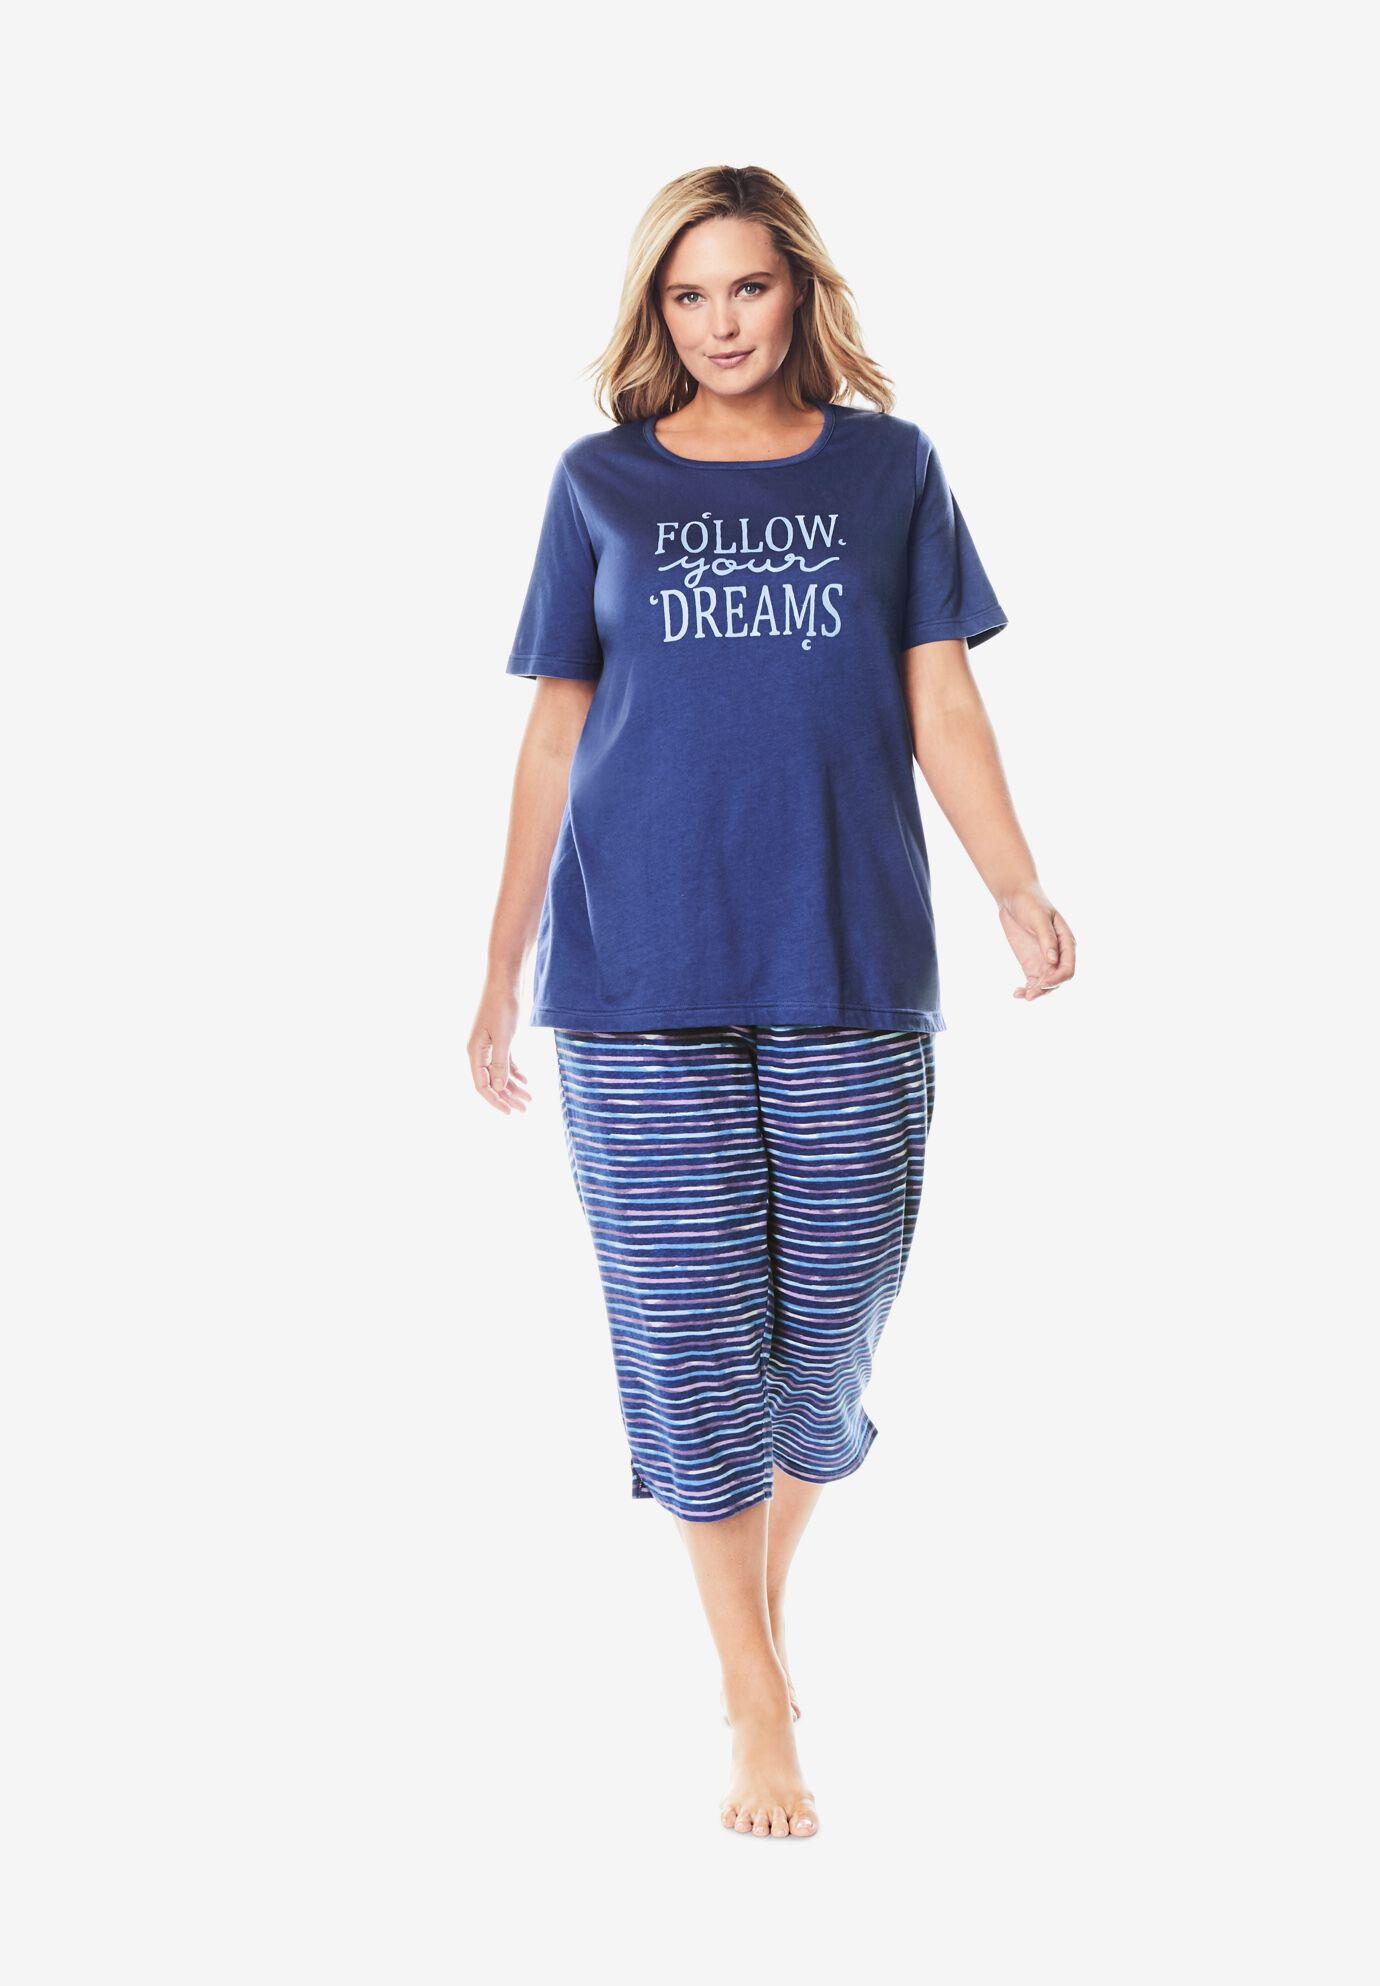 Womens Plus Size Lounge Tee Dreams /& Co